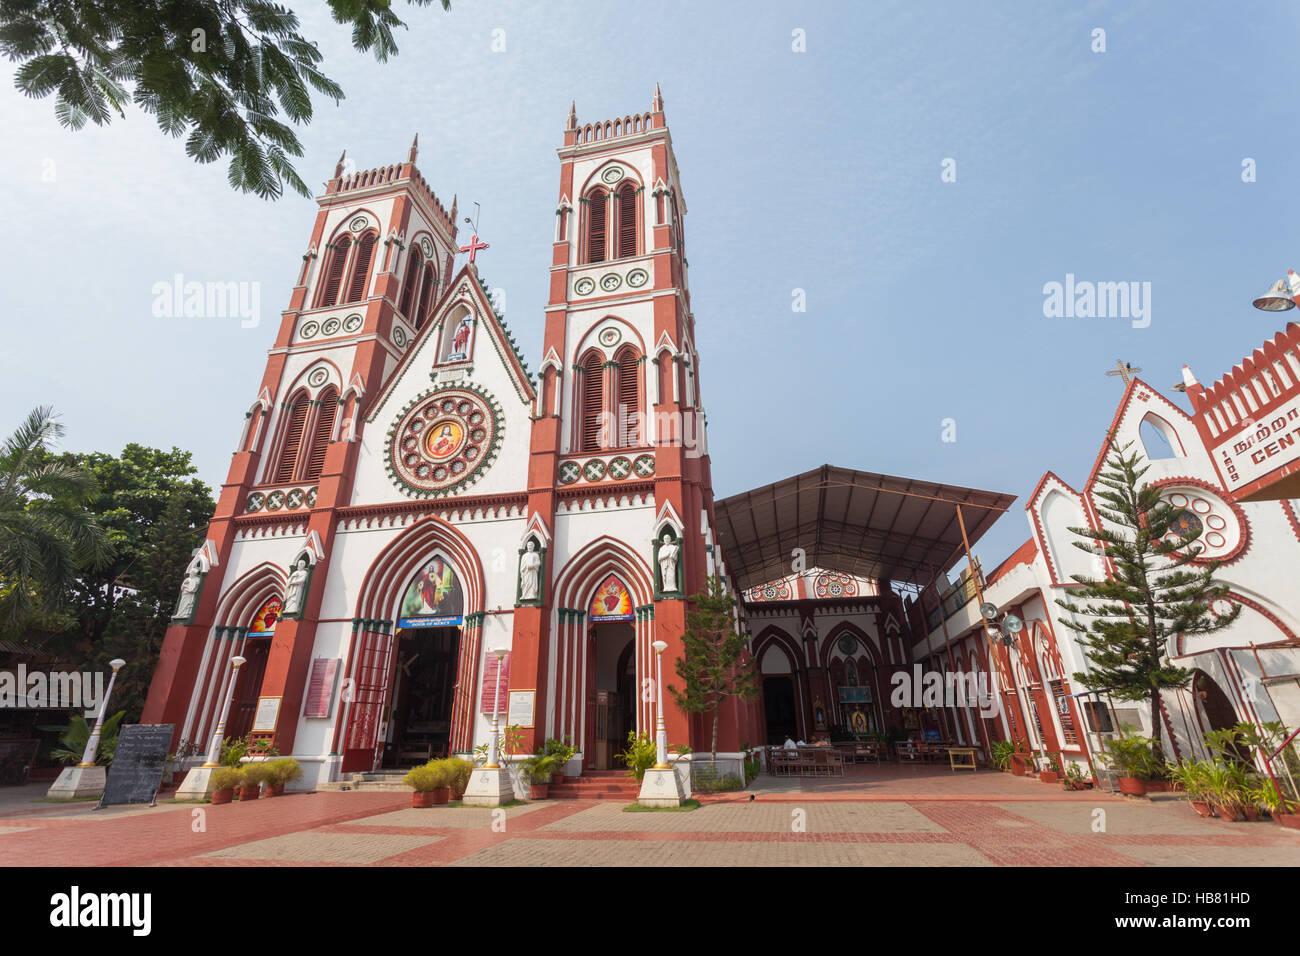 Basilica of the Sacred Heart of Jesus, Pondicherry, Tamil Nadu, India - Stock Image